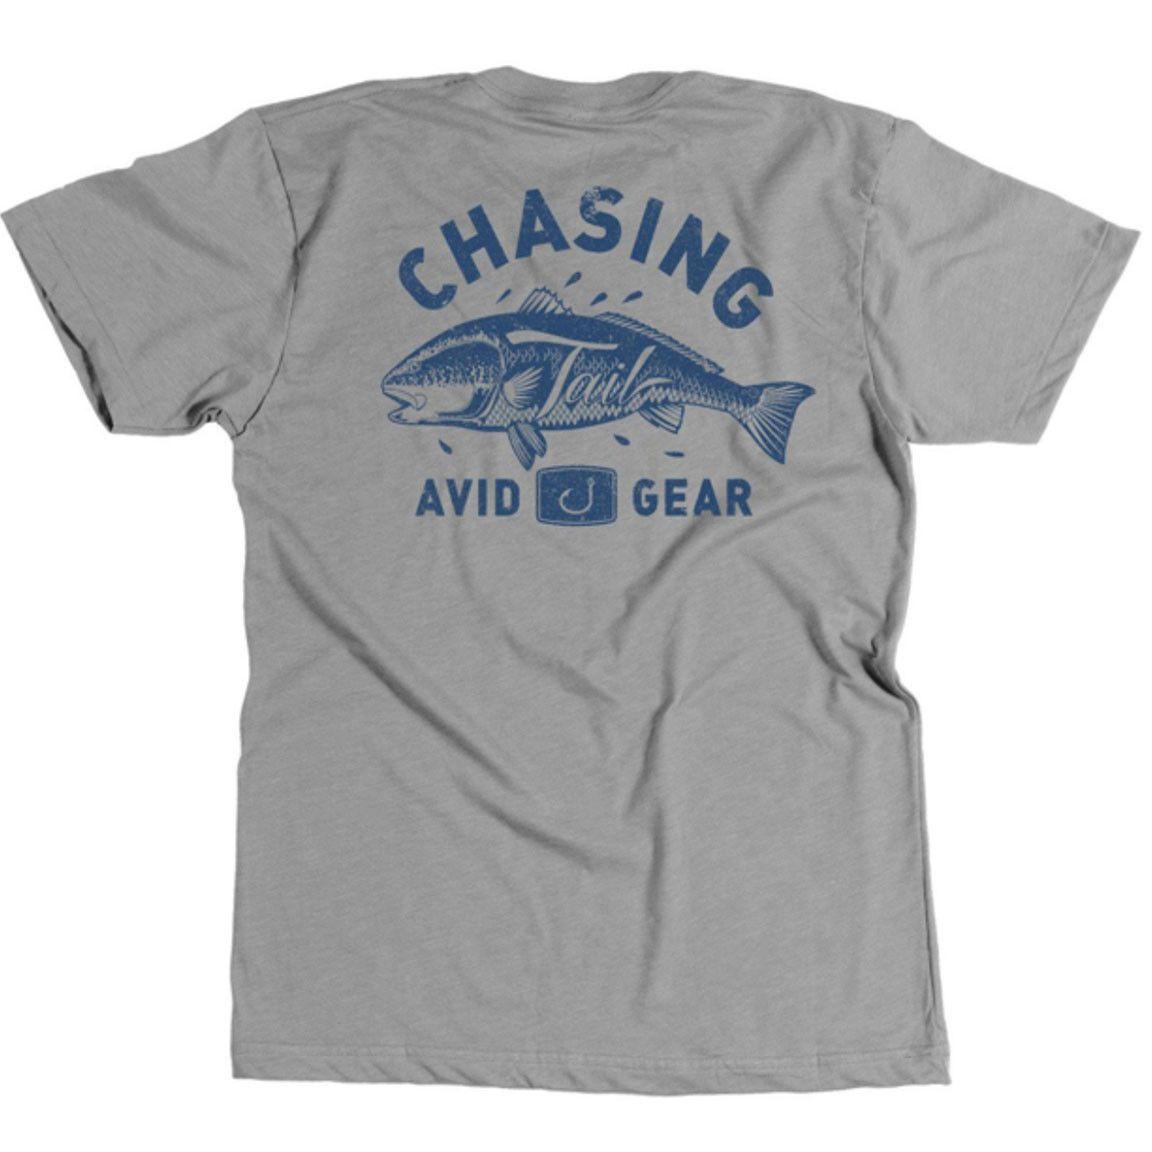 Avid - Chasing Tail Tee - Heather Grey